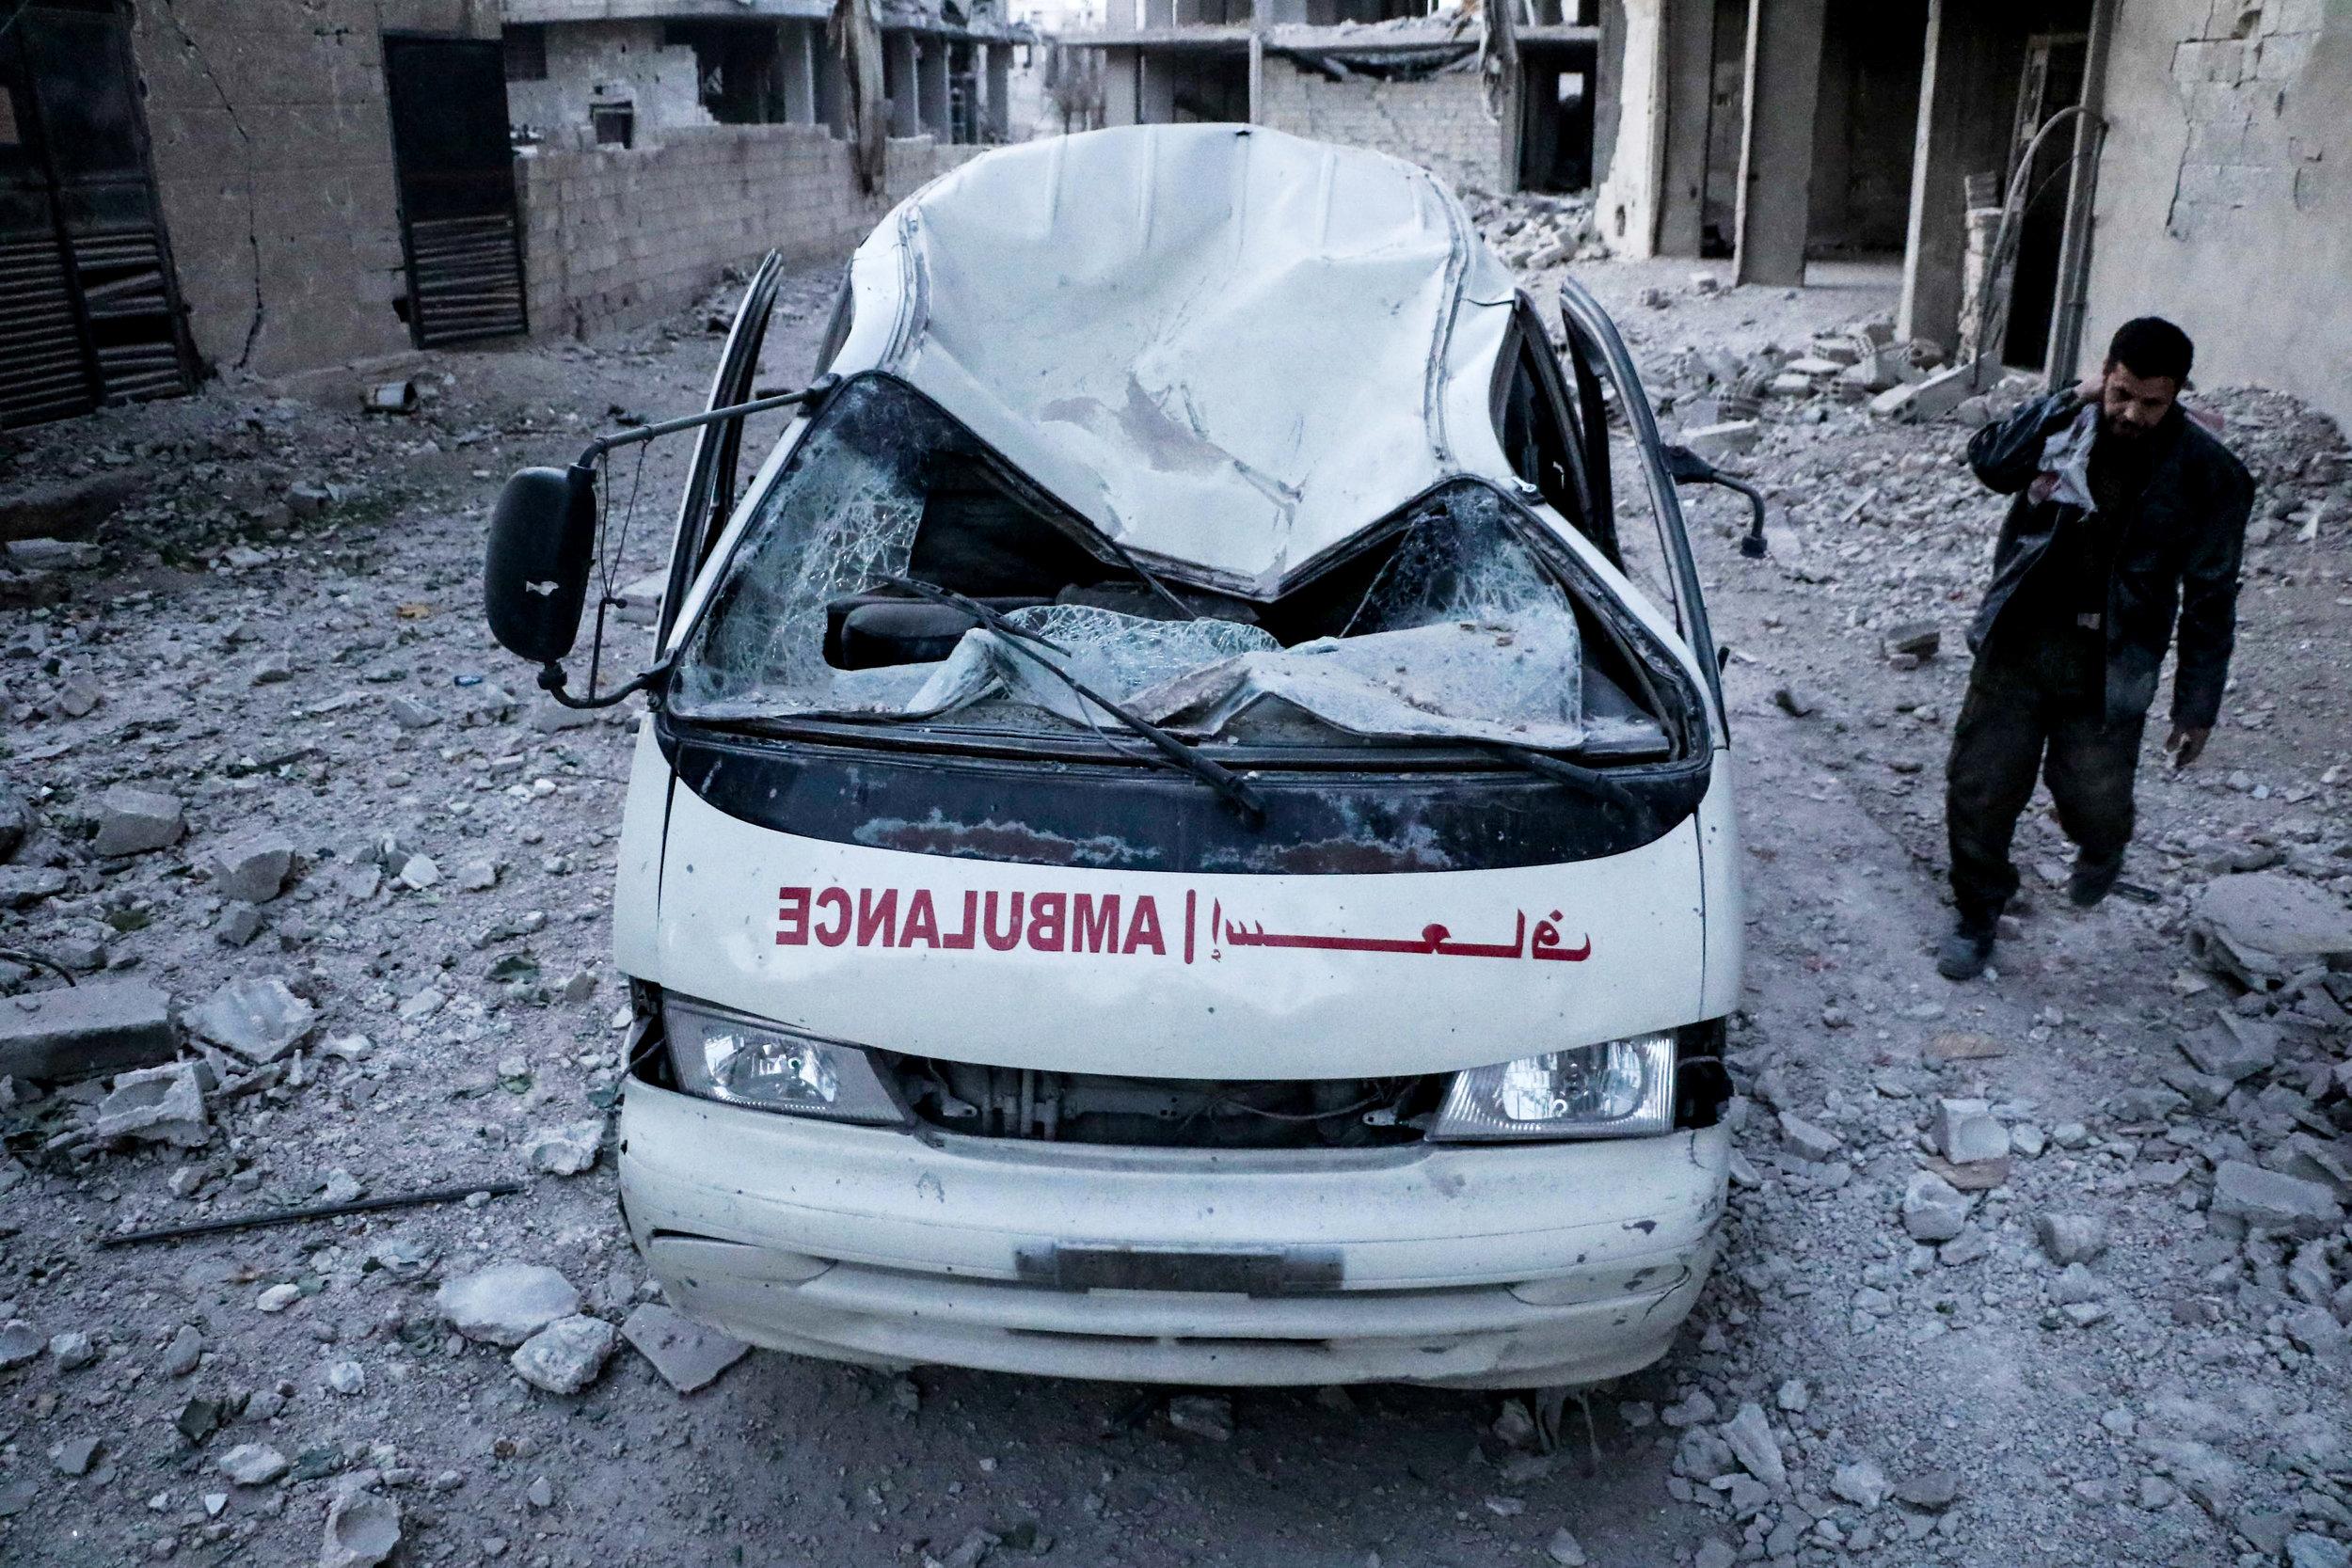 2018-02-23-Ghouta.jpg